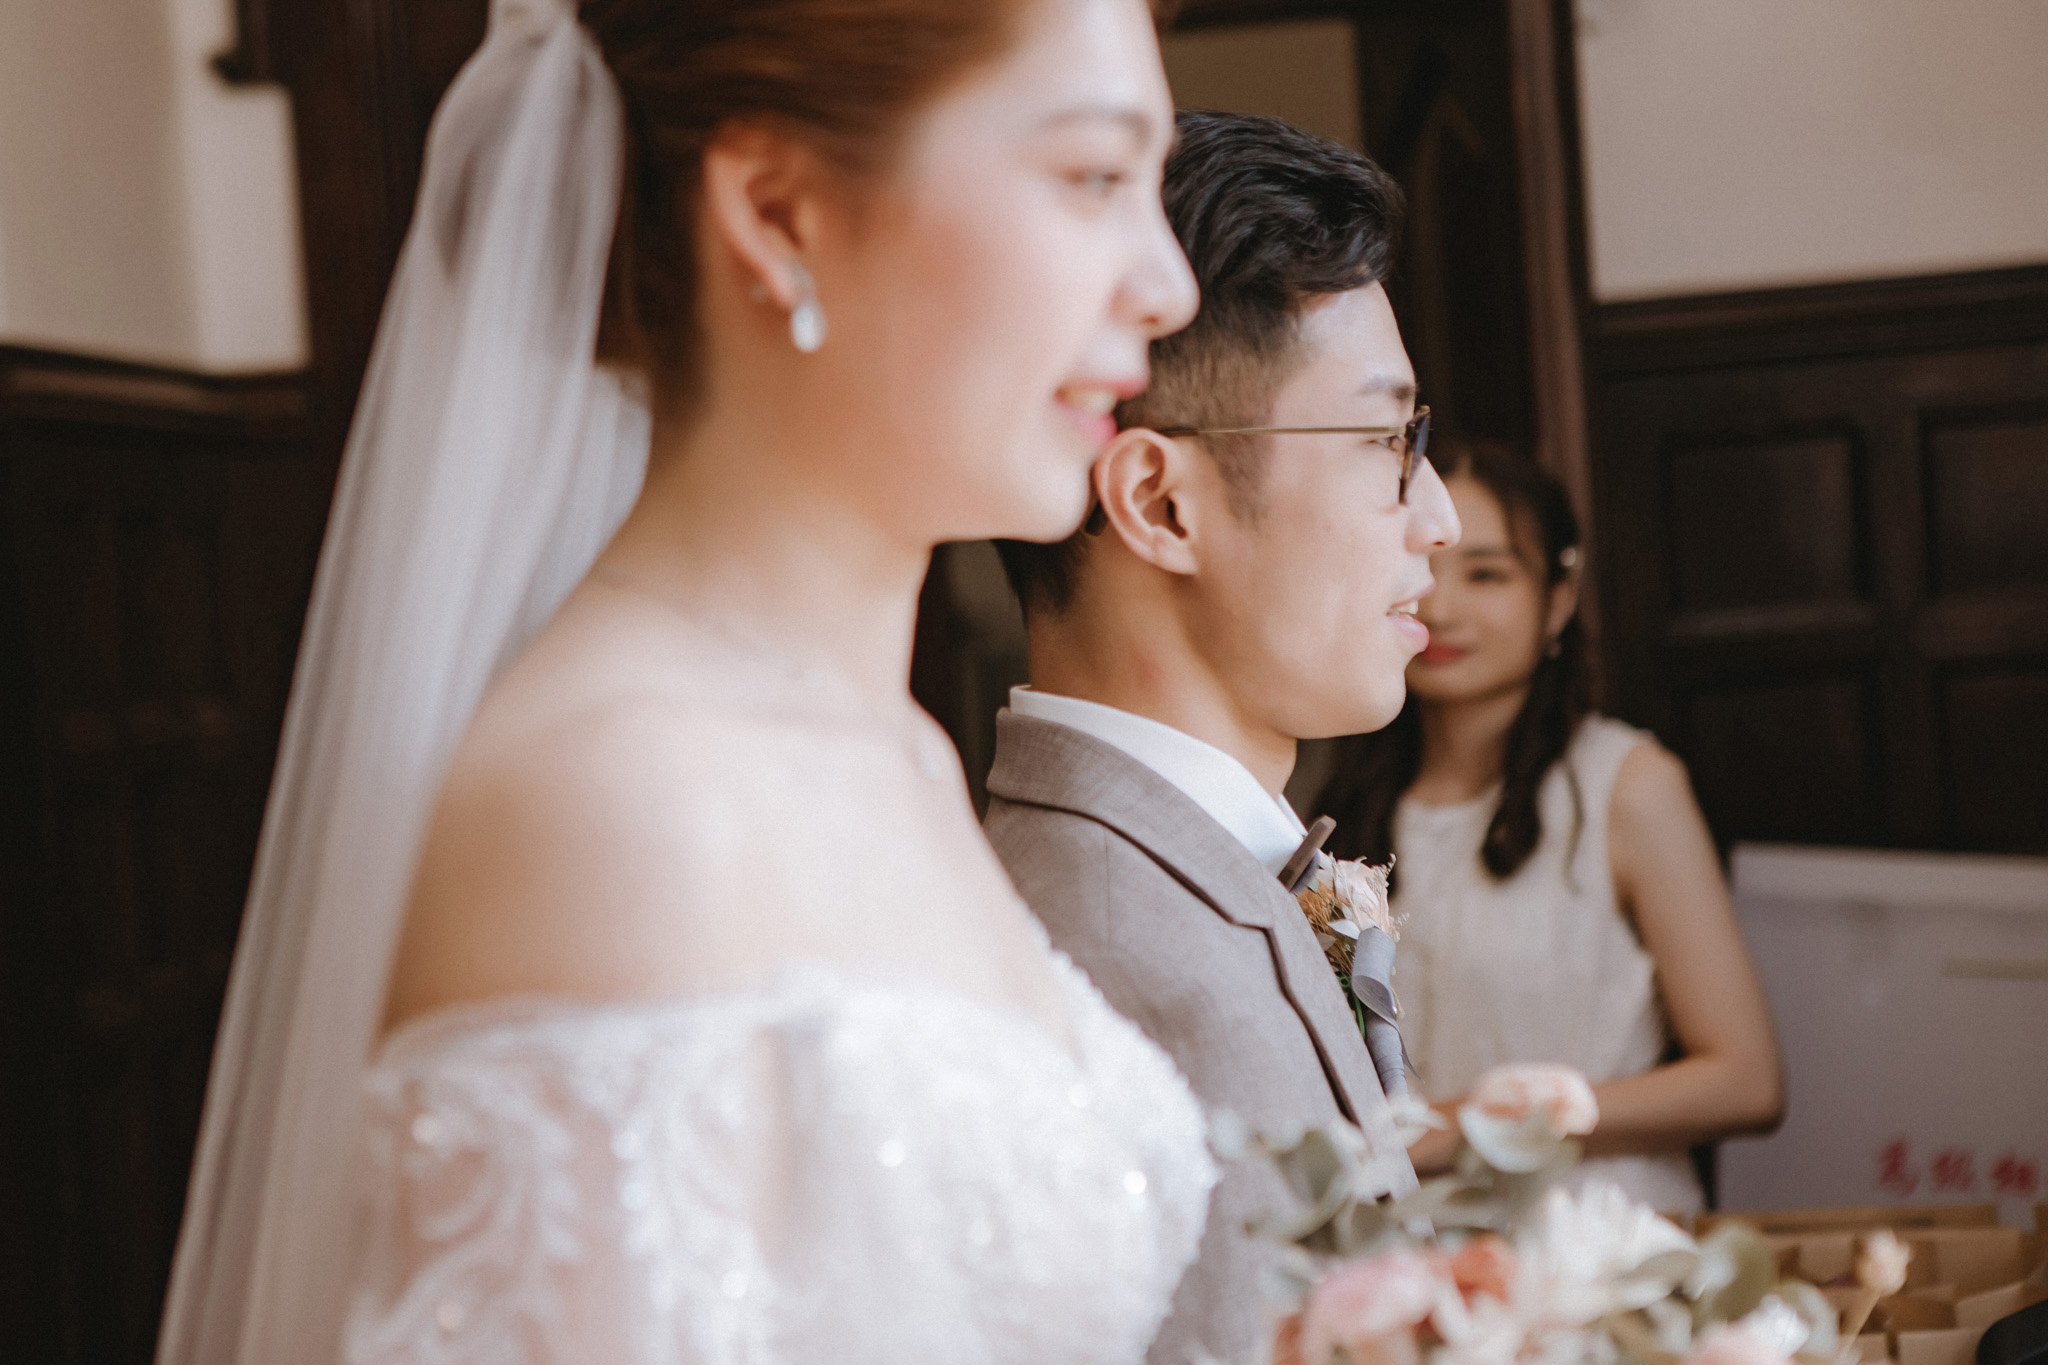 EW 台北婚攝 居米 濟南教會 Brick Yard 33 美軍俱樂部 婚禮 婚宴-50